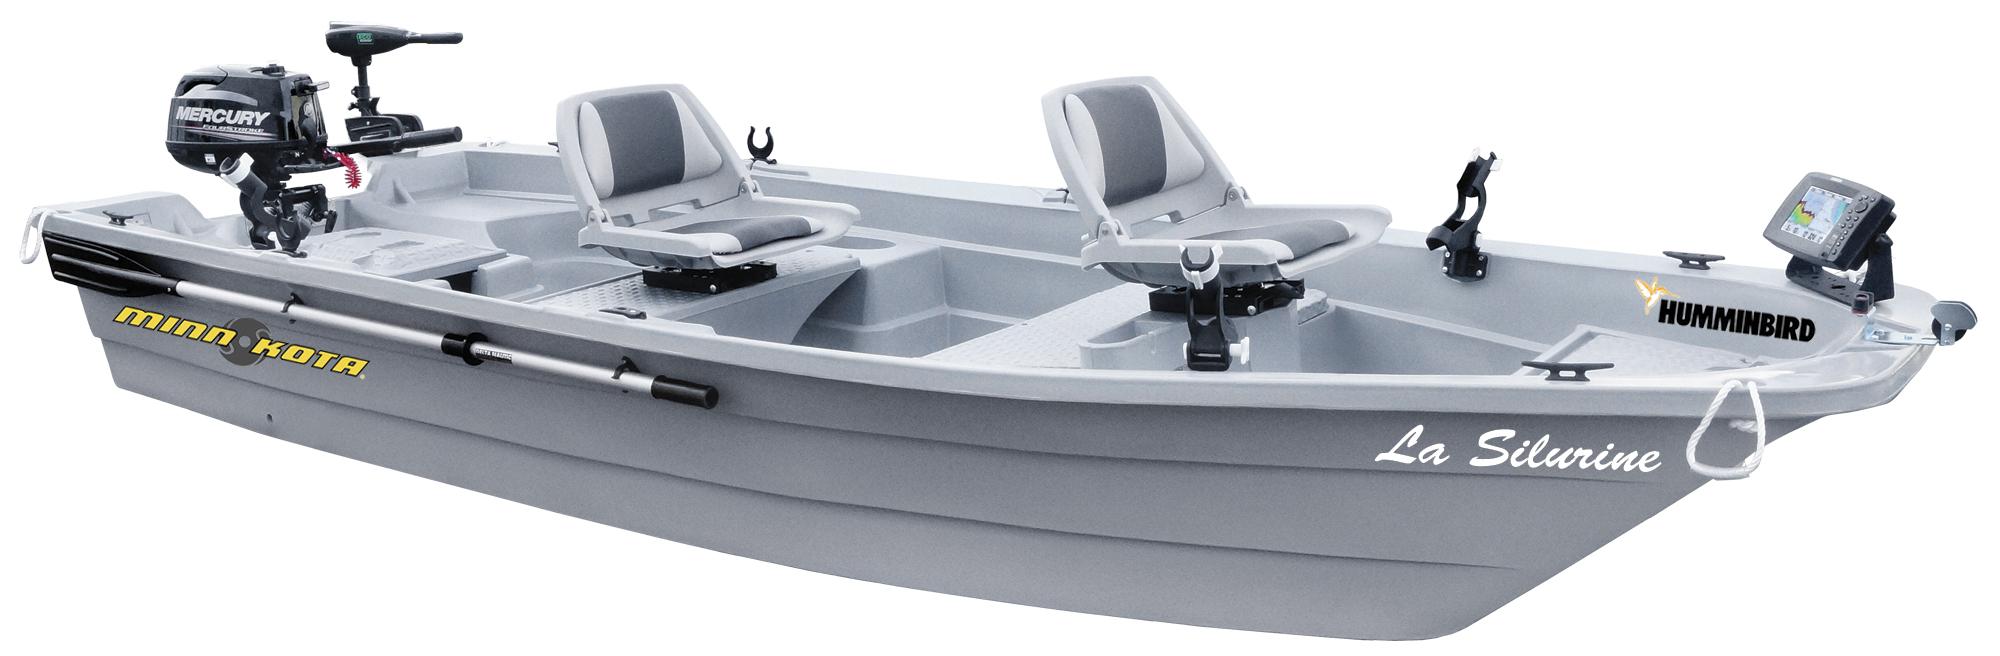 bateau peche silurine